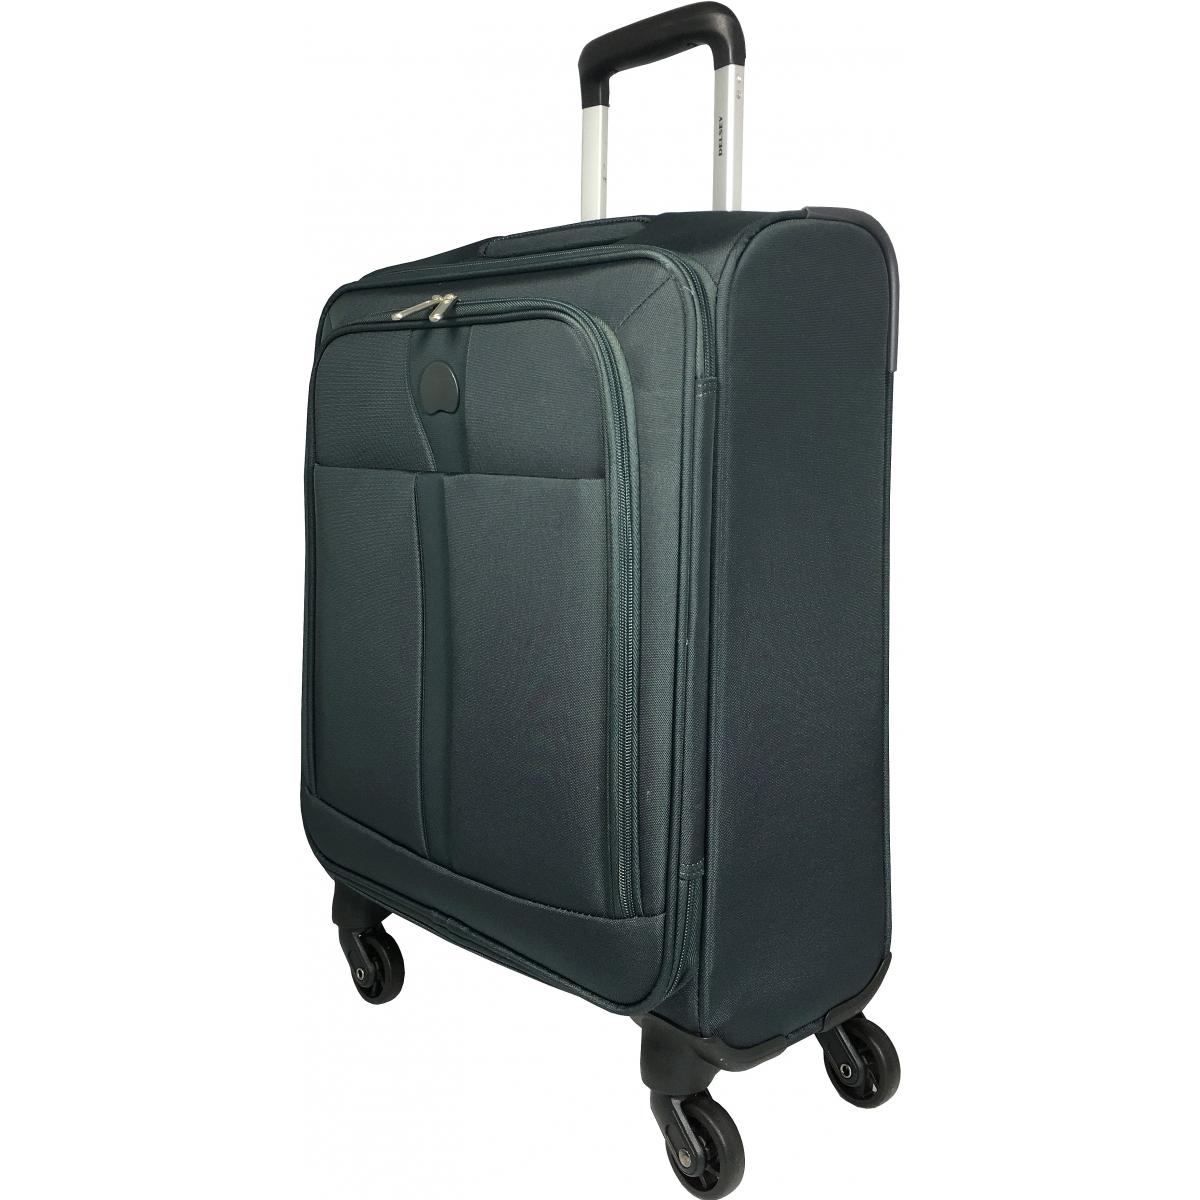 valise cabine souple tsa delsey maloti 55 cm maloti 803 gris couleur principale gris 11